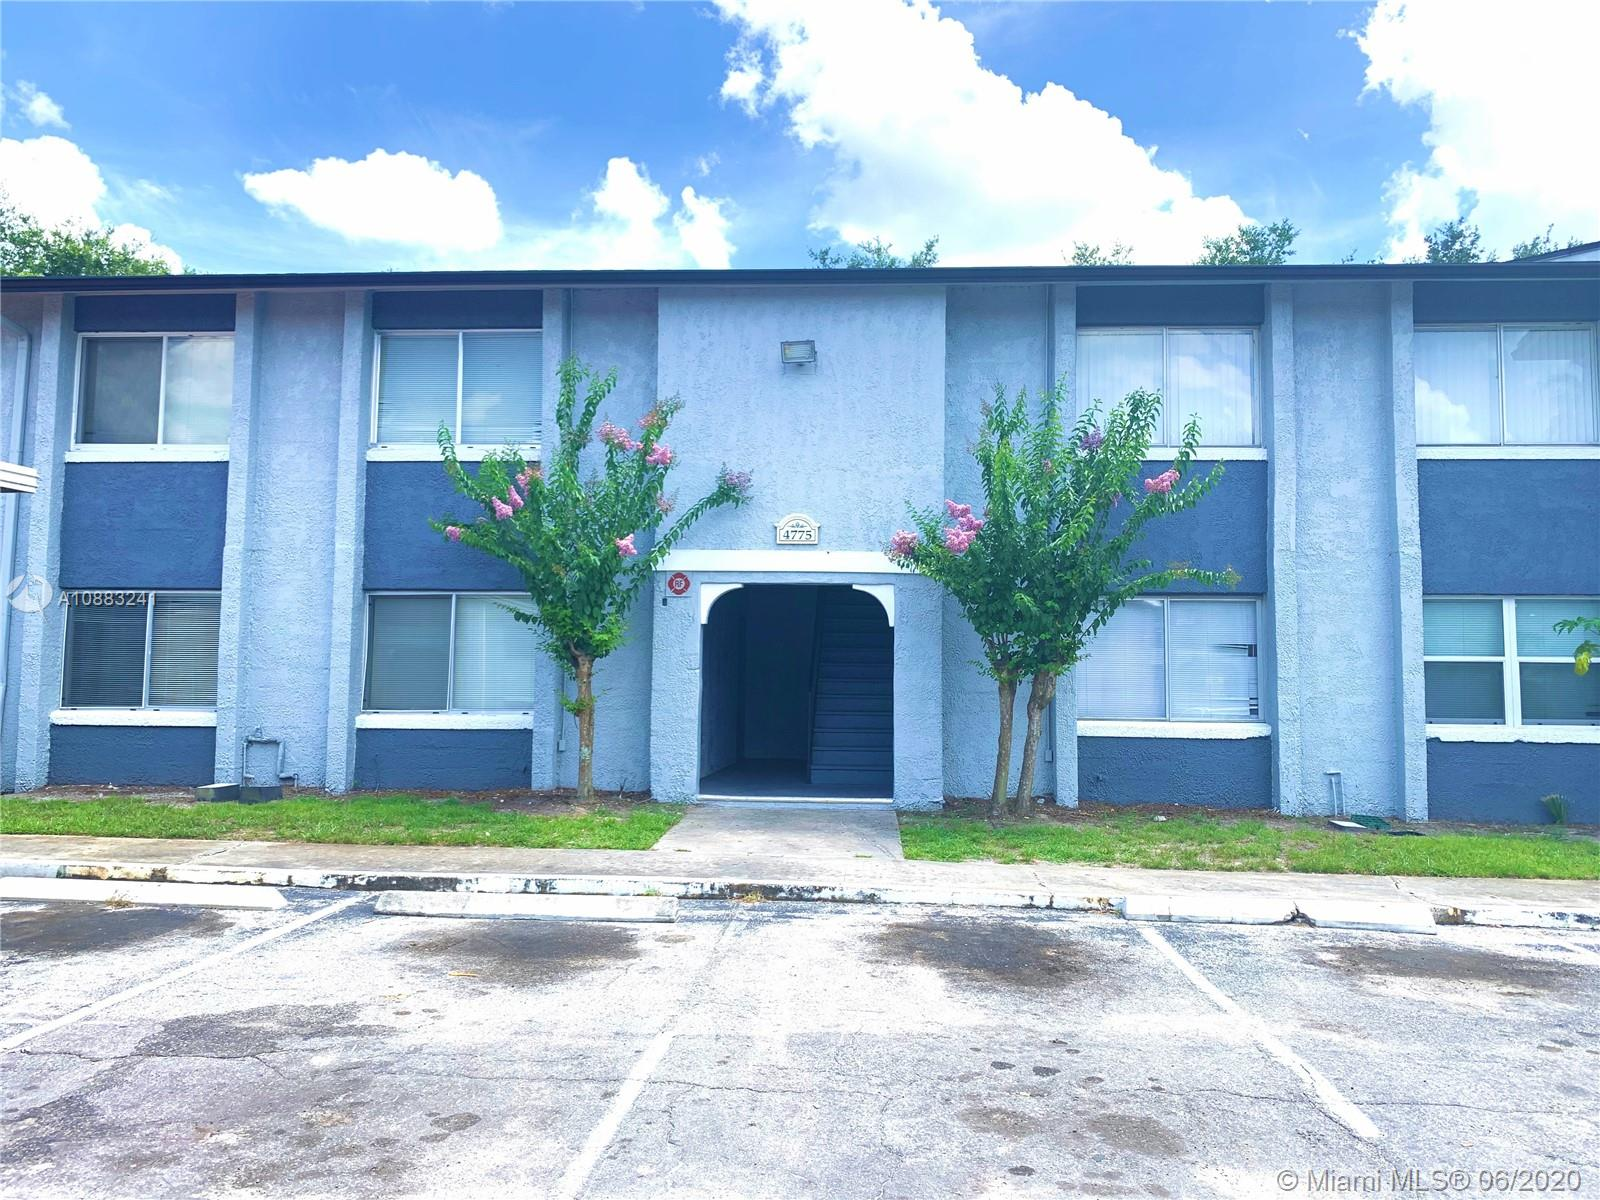 image #1 of property, Millennium Palms Condomini, Unit 4775A